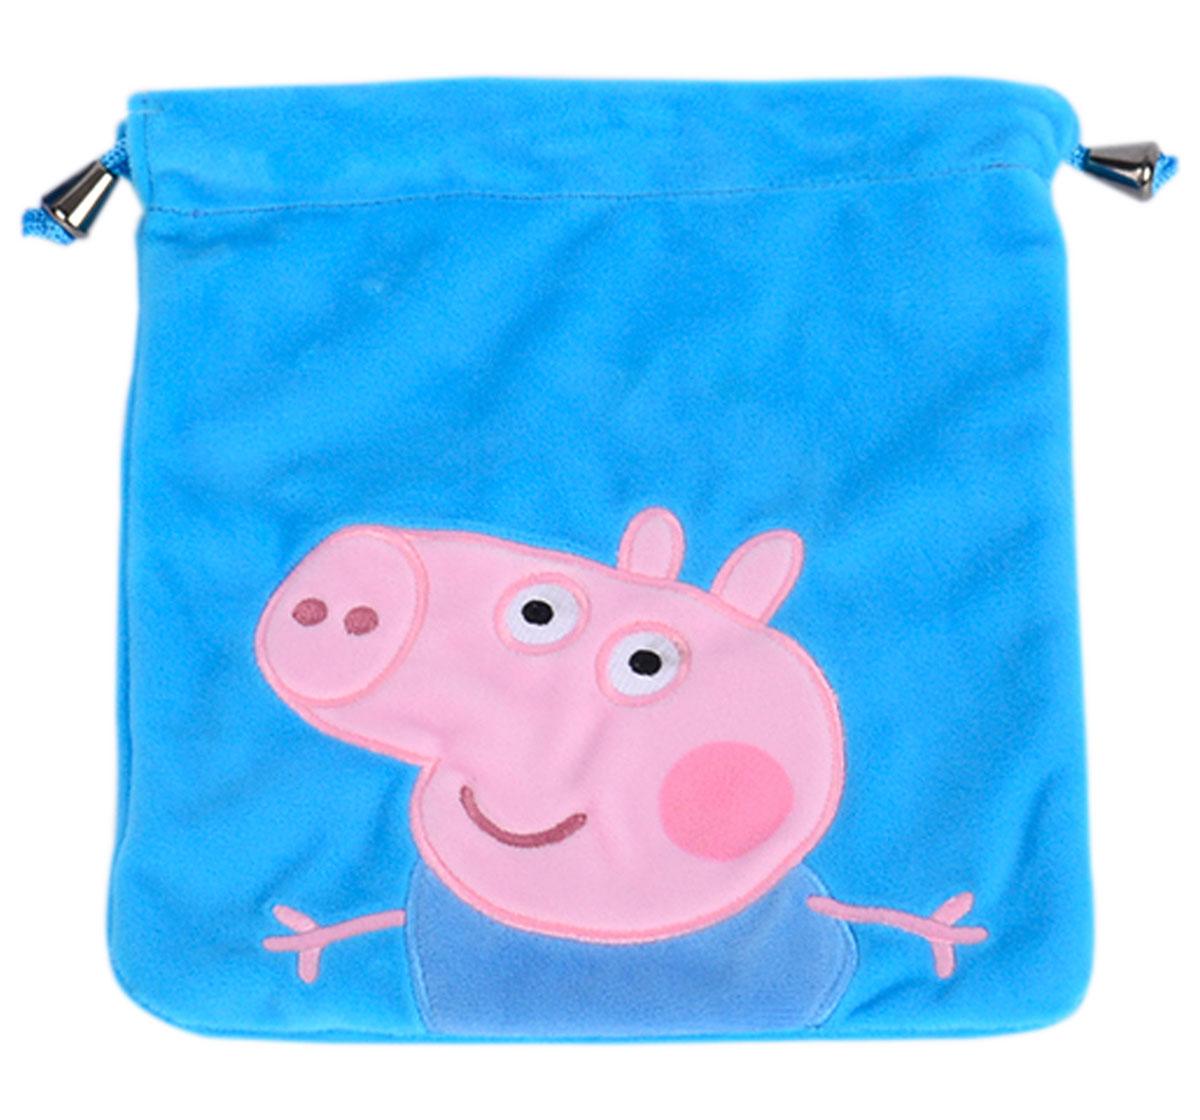 Peppa Pig   George Pig Blue Plush Toy Bag, 2Y+